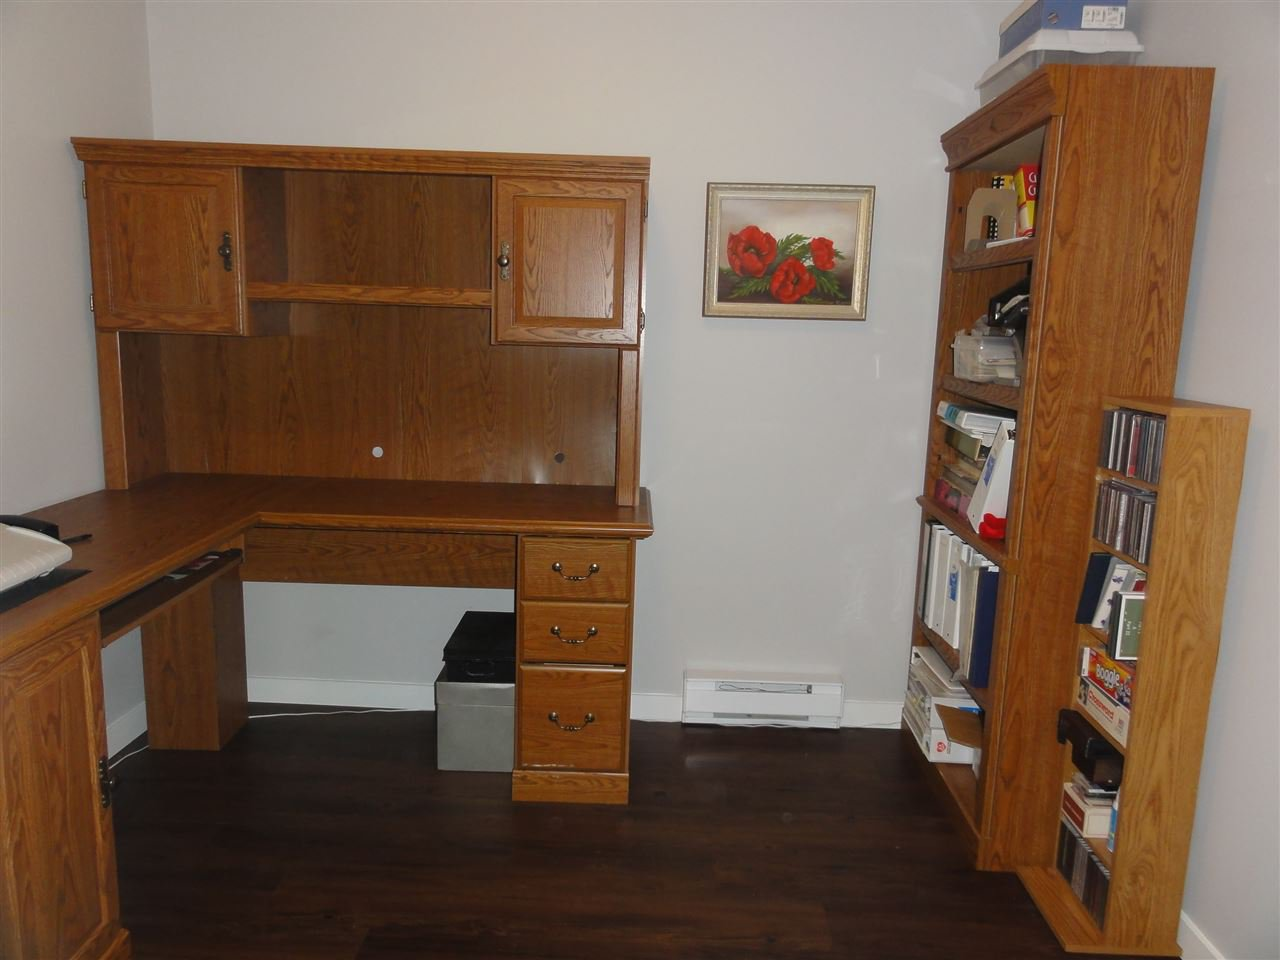 "Photo 7: Photos: 431 22323 48 Avenue in Langley: Murrayville Condo for sale in ""AVALON GARDENS"" : MLS®# R2134591"